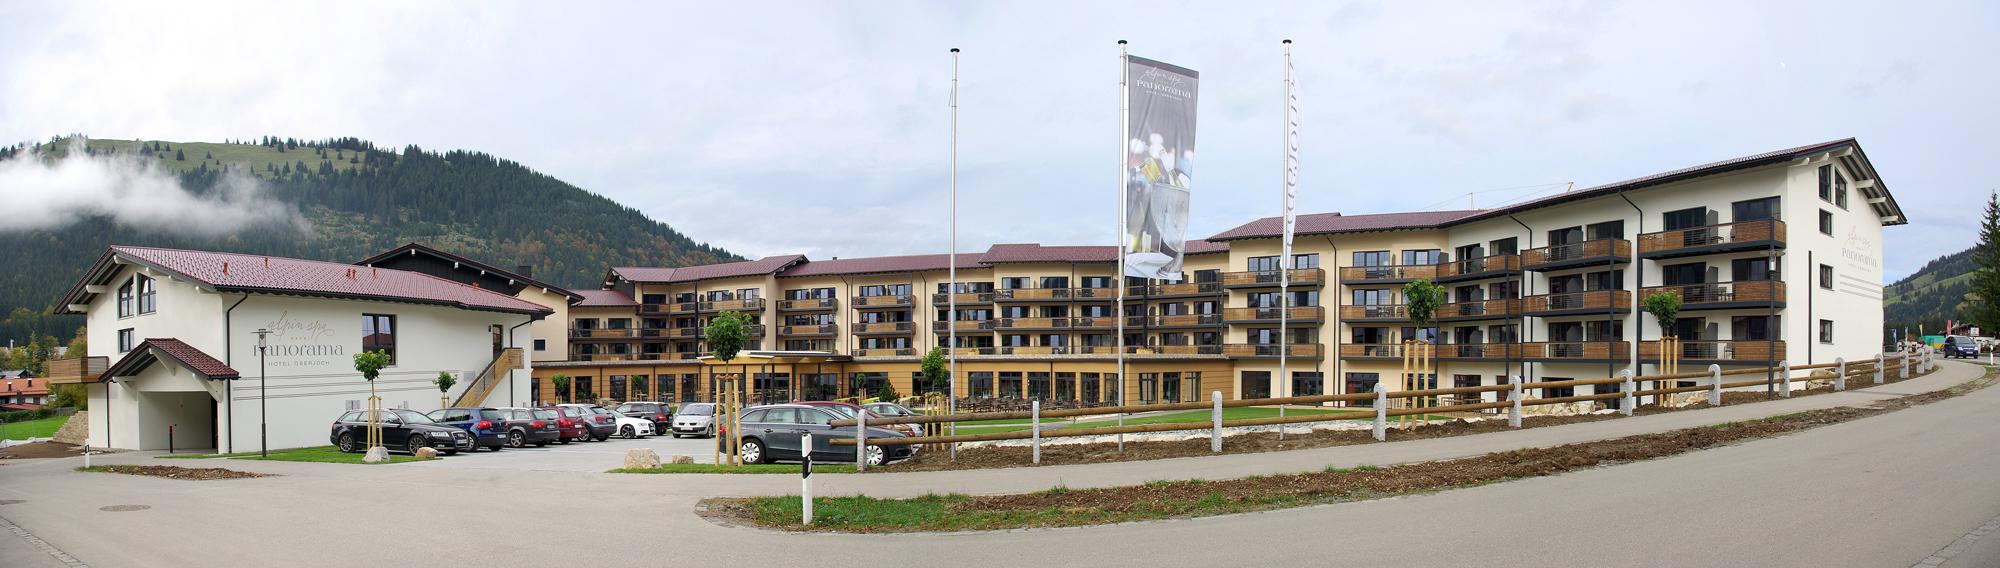 Alpin Spa Hotel Oberjoch